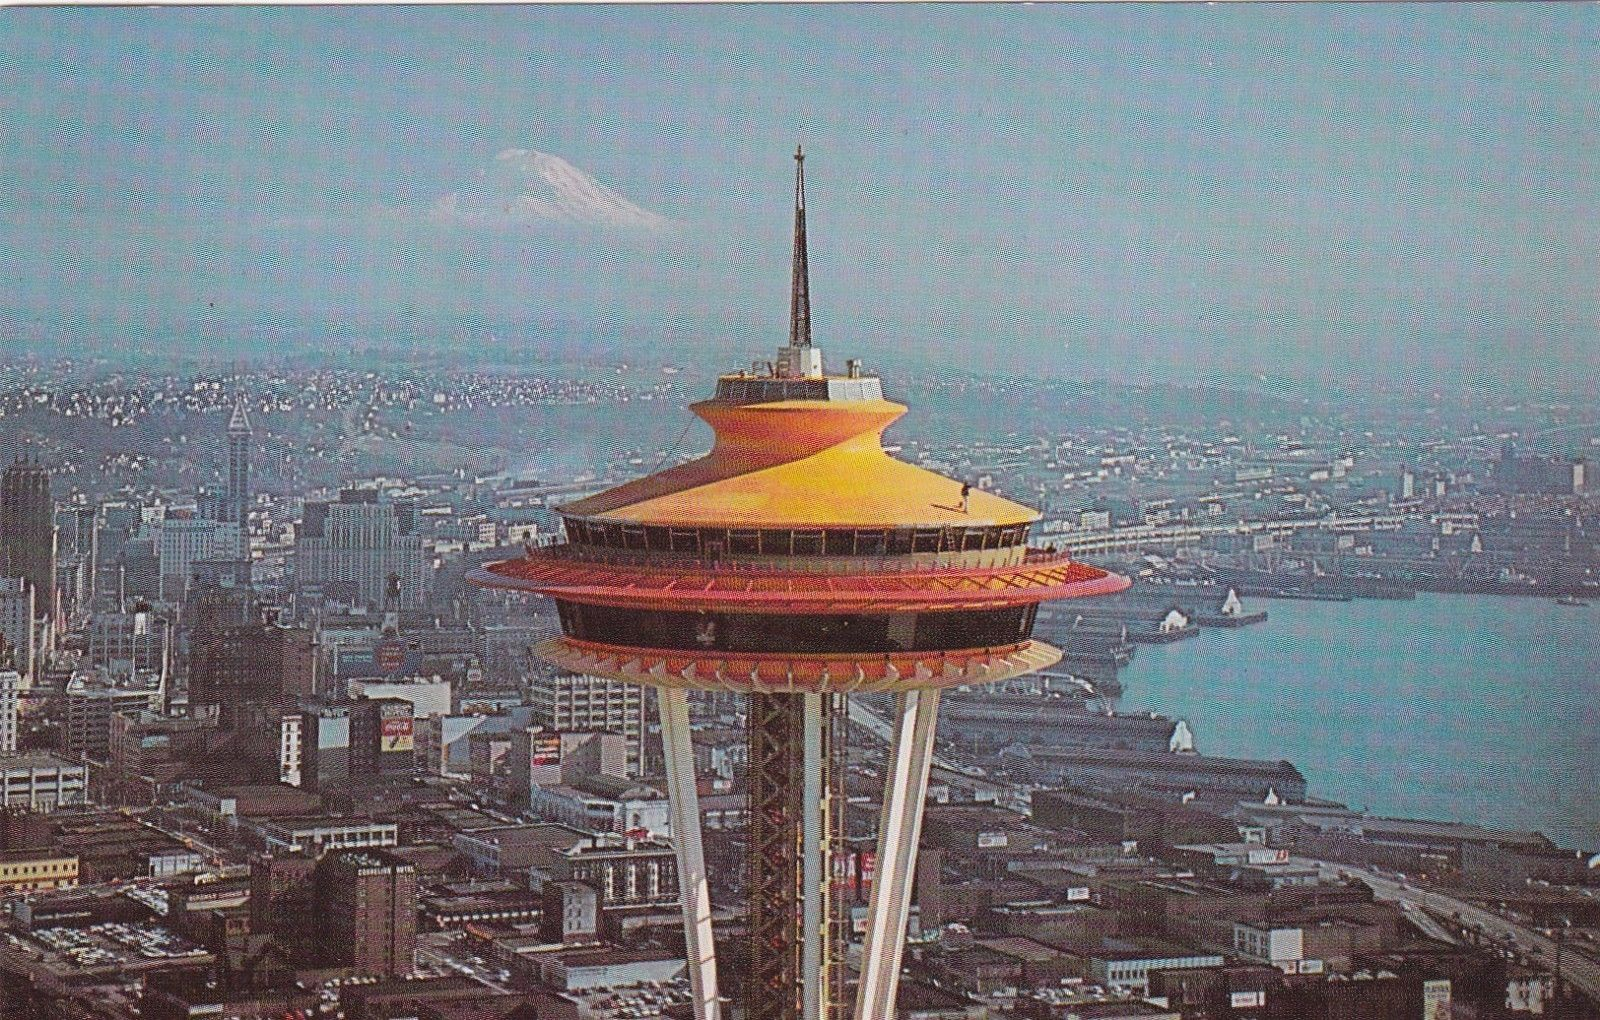 3 Vintage Original Orange Roof Space Needle Seattle Washington Postcard Space Needle Seattle Space Needle Seattle Washington